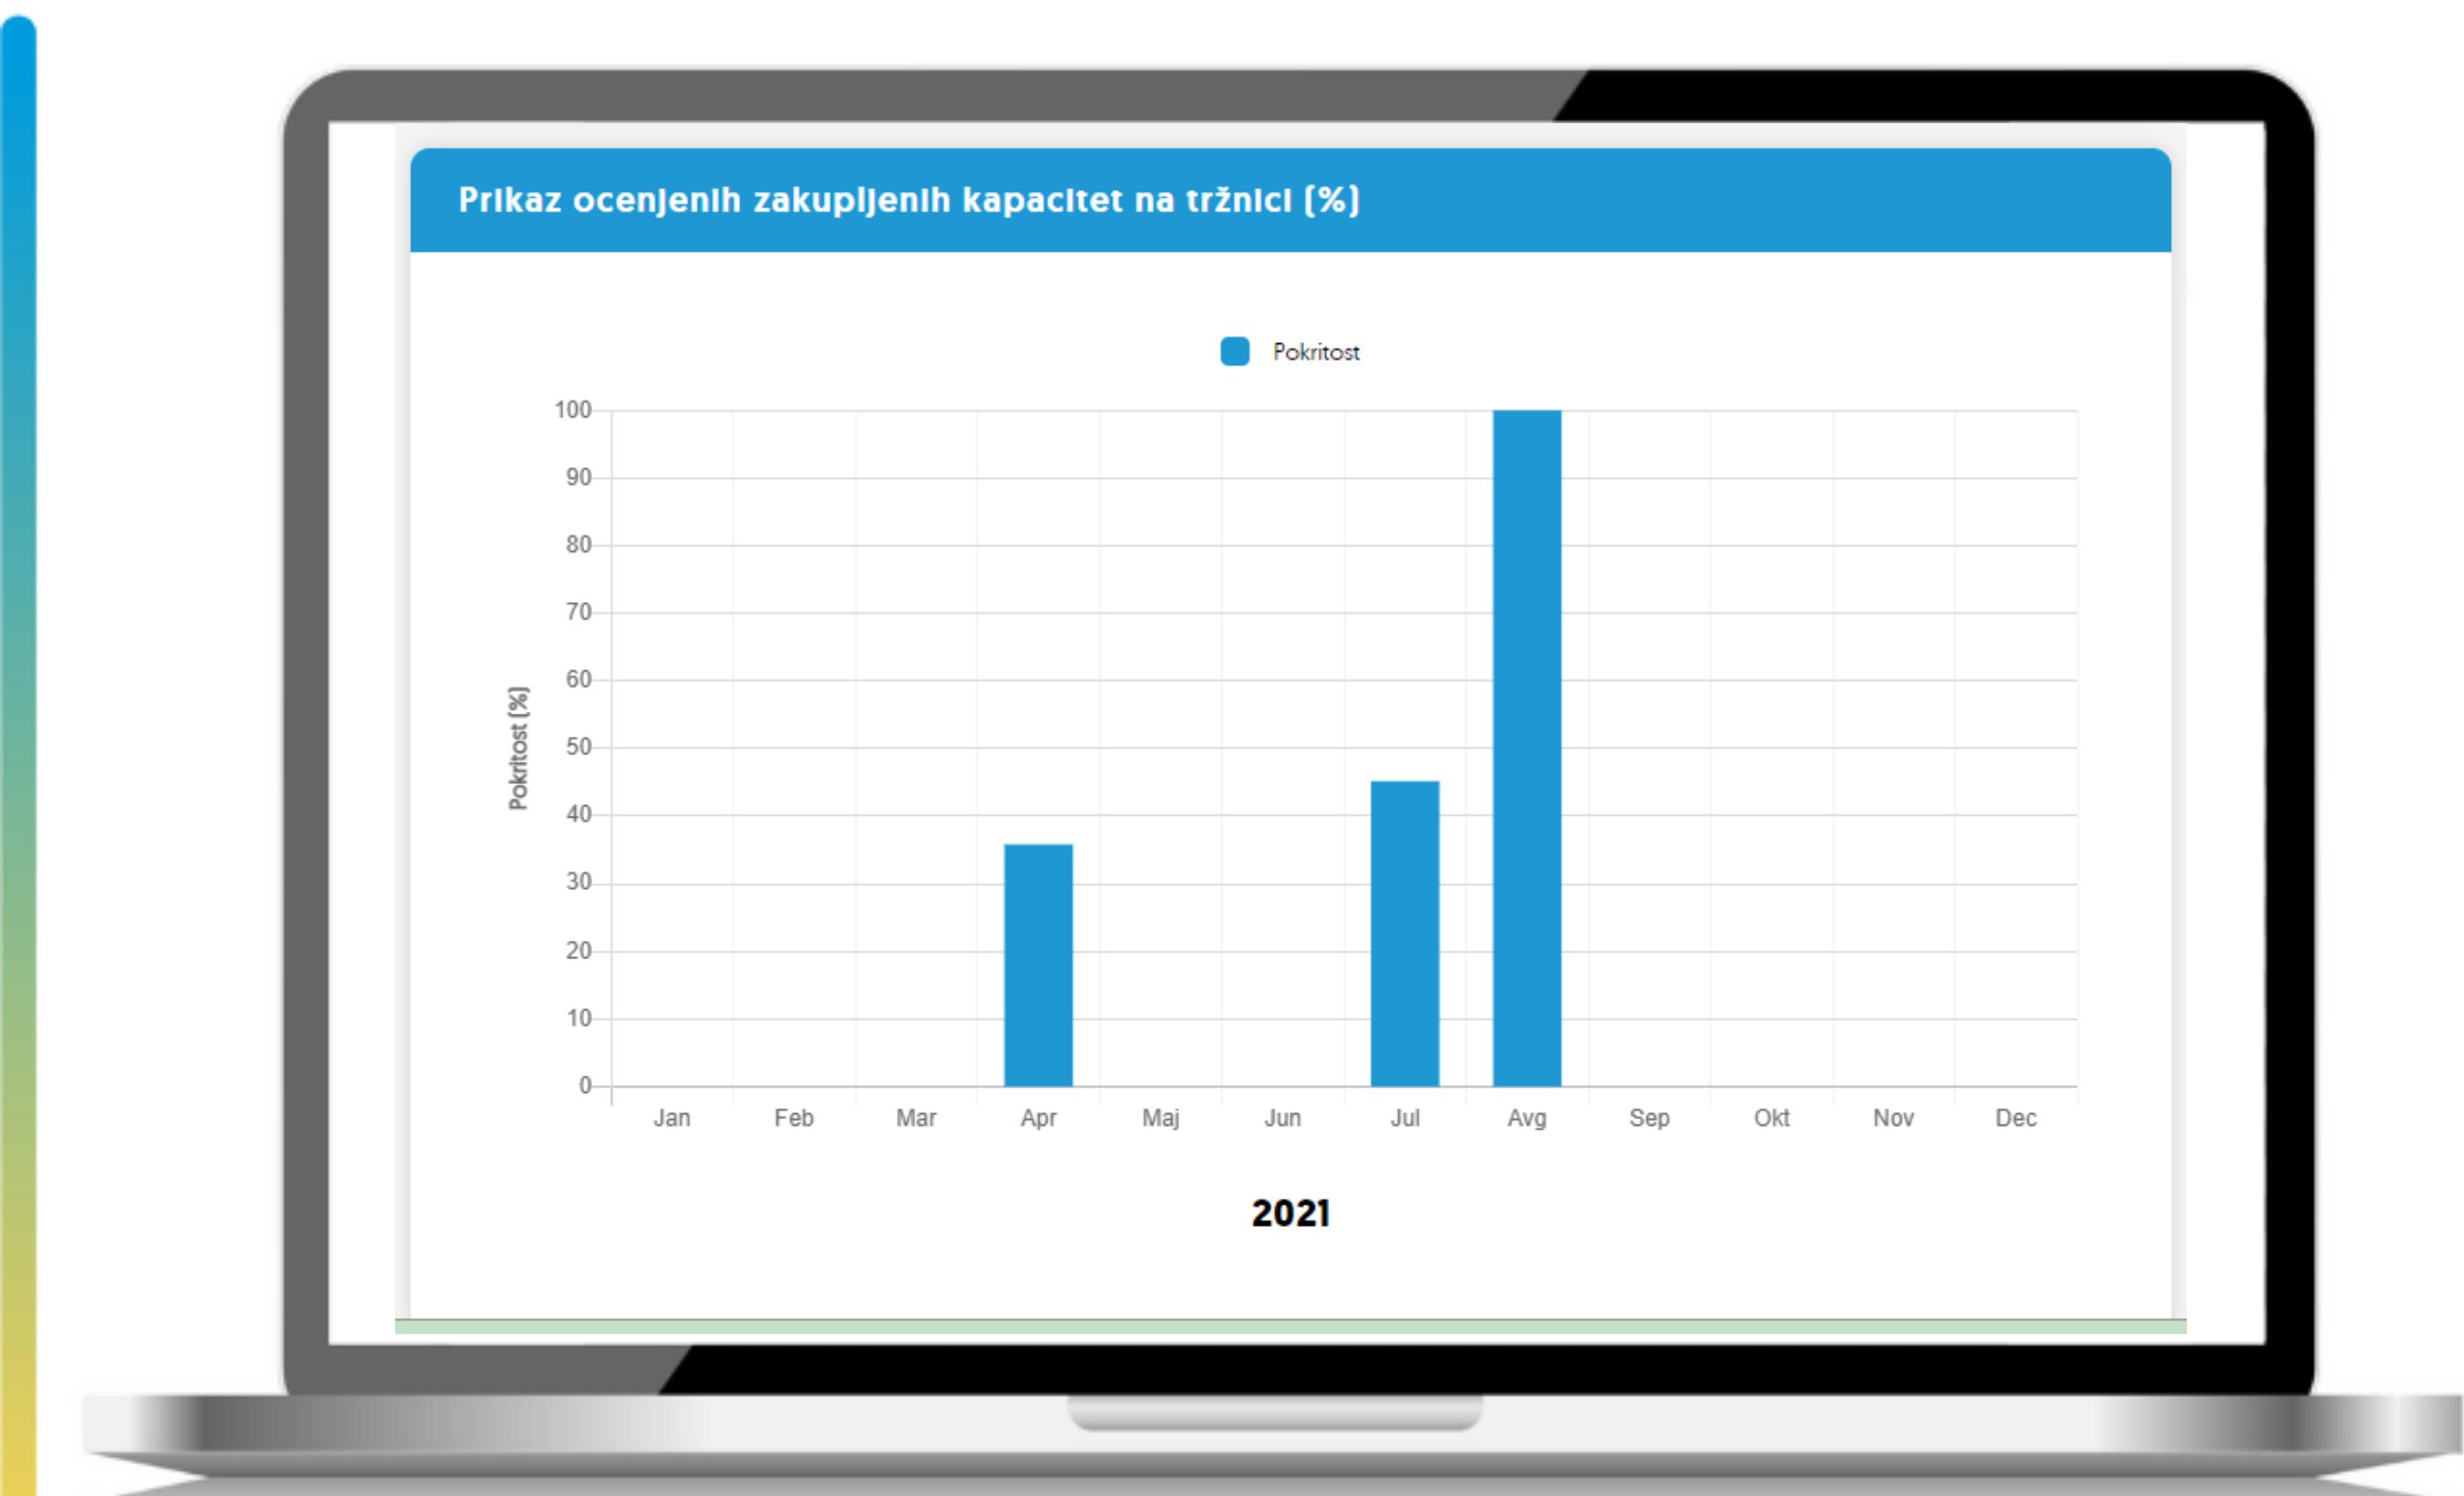 prikaz ocenjenih zakupljenih kapacitet na trznici (1)